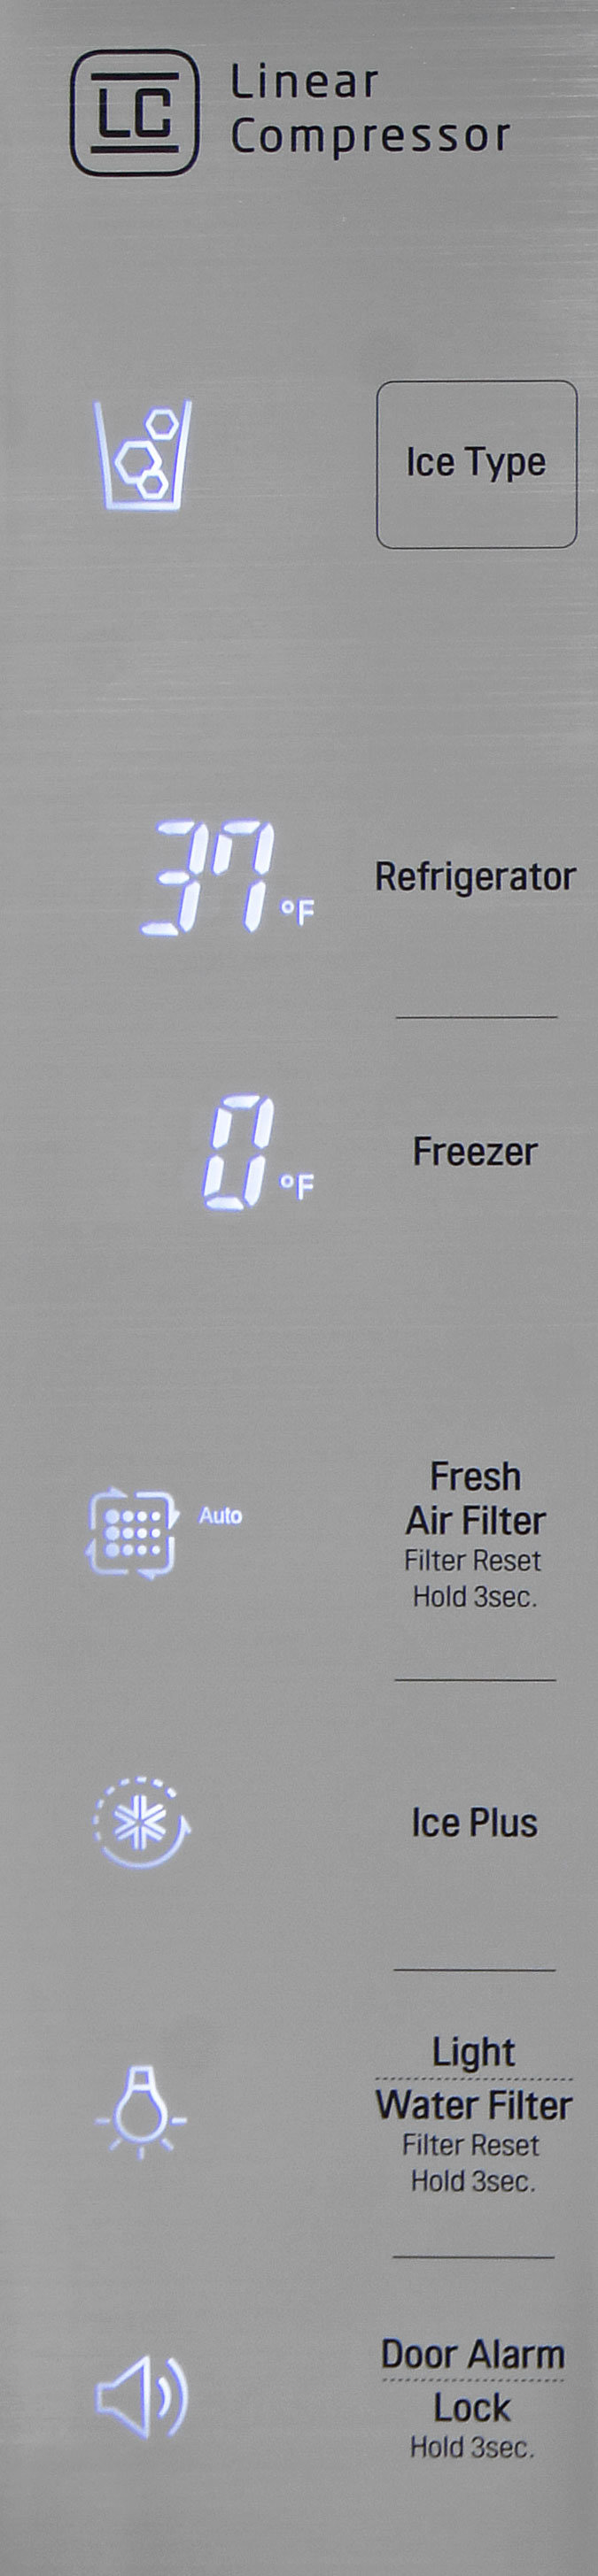 Lg Lmxs30776s Refrigerator Review